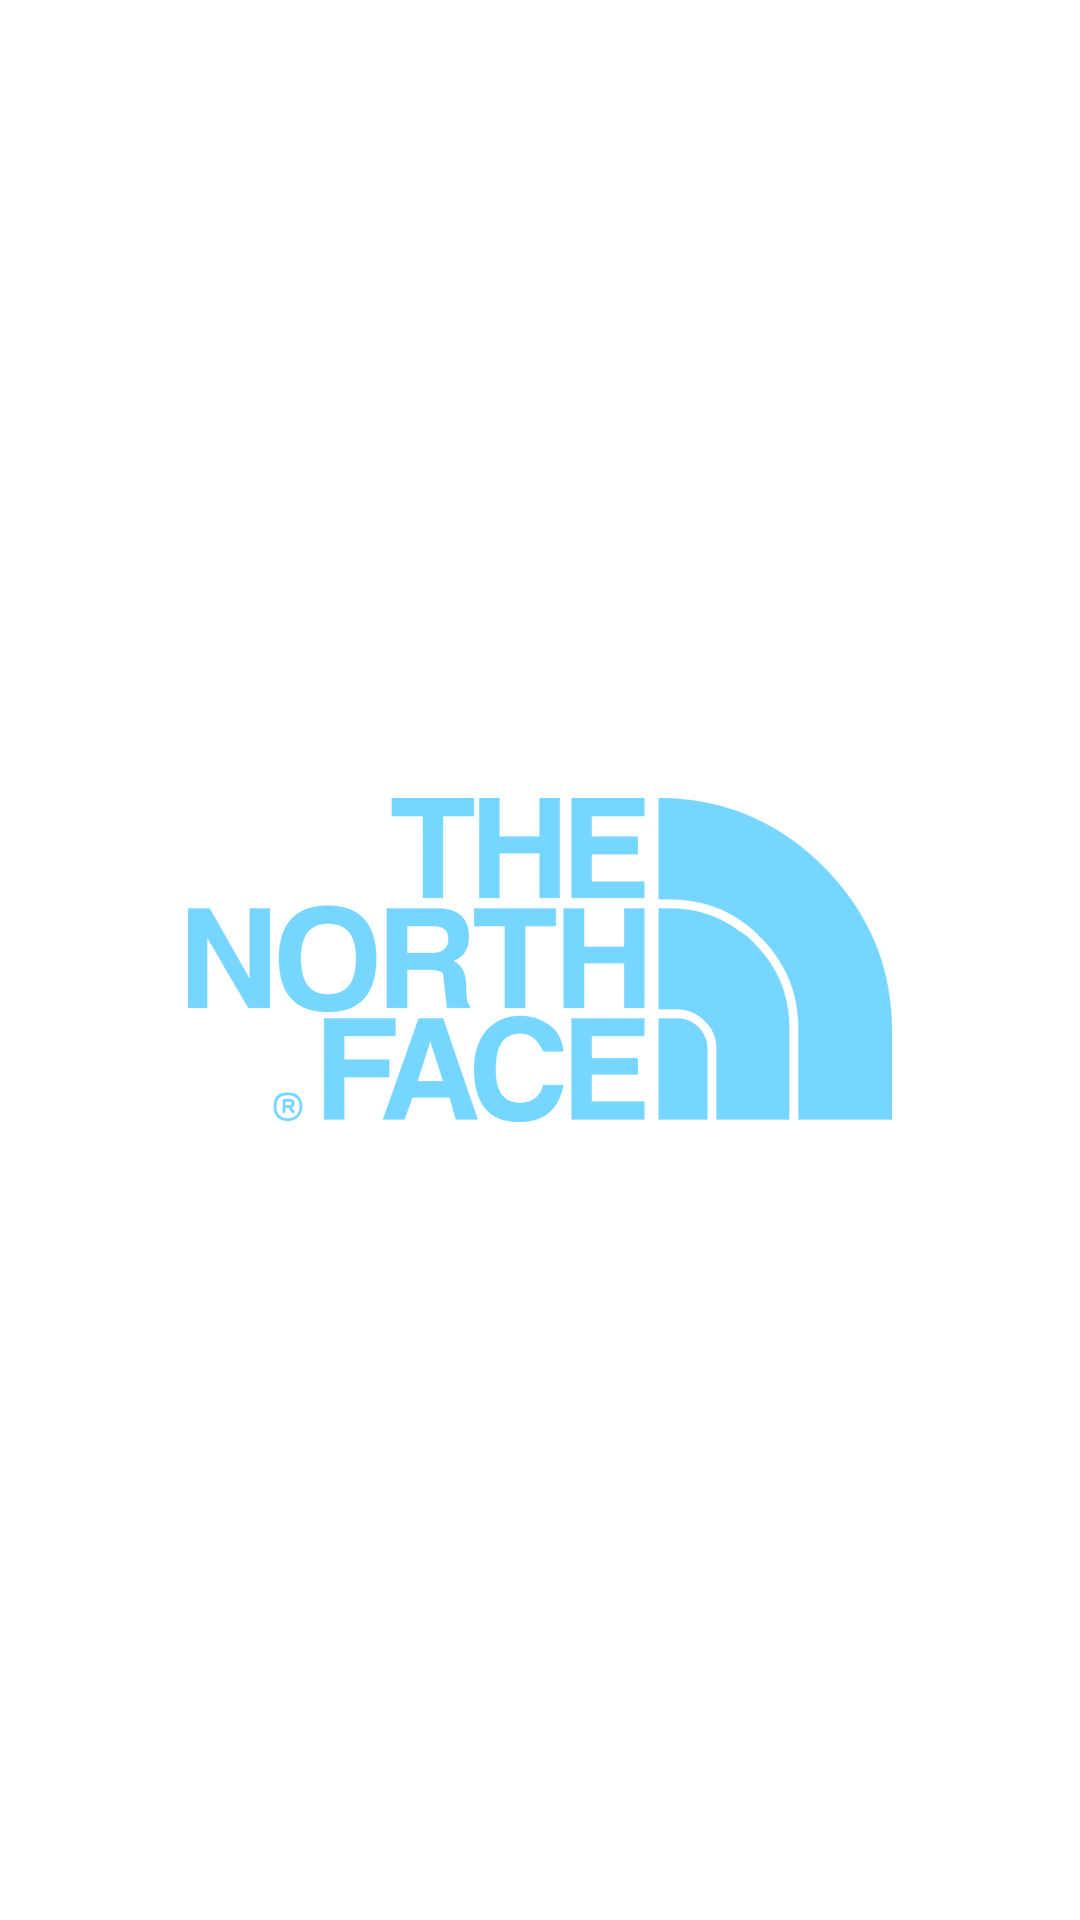 northface08